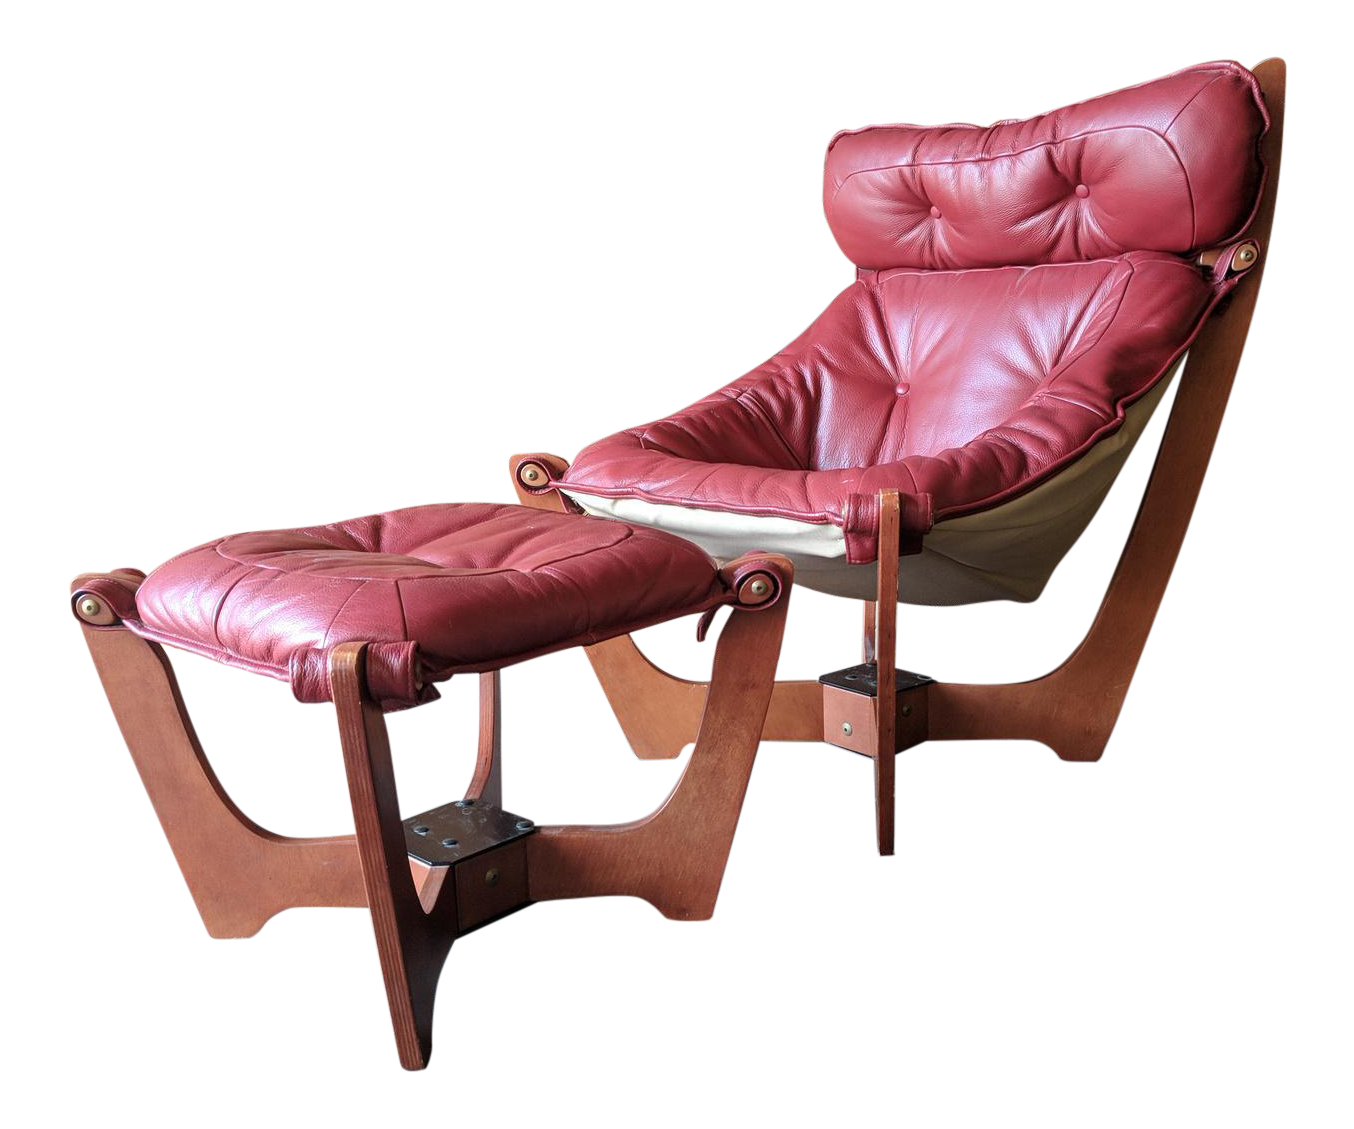 Odd Knutsen Scandinavian Design Soft Red Leather Luna Chair And Ottoman